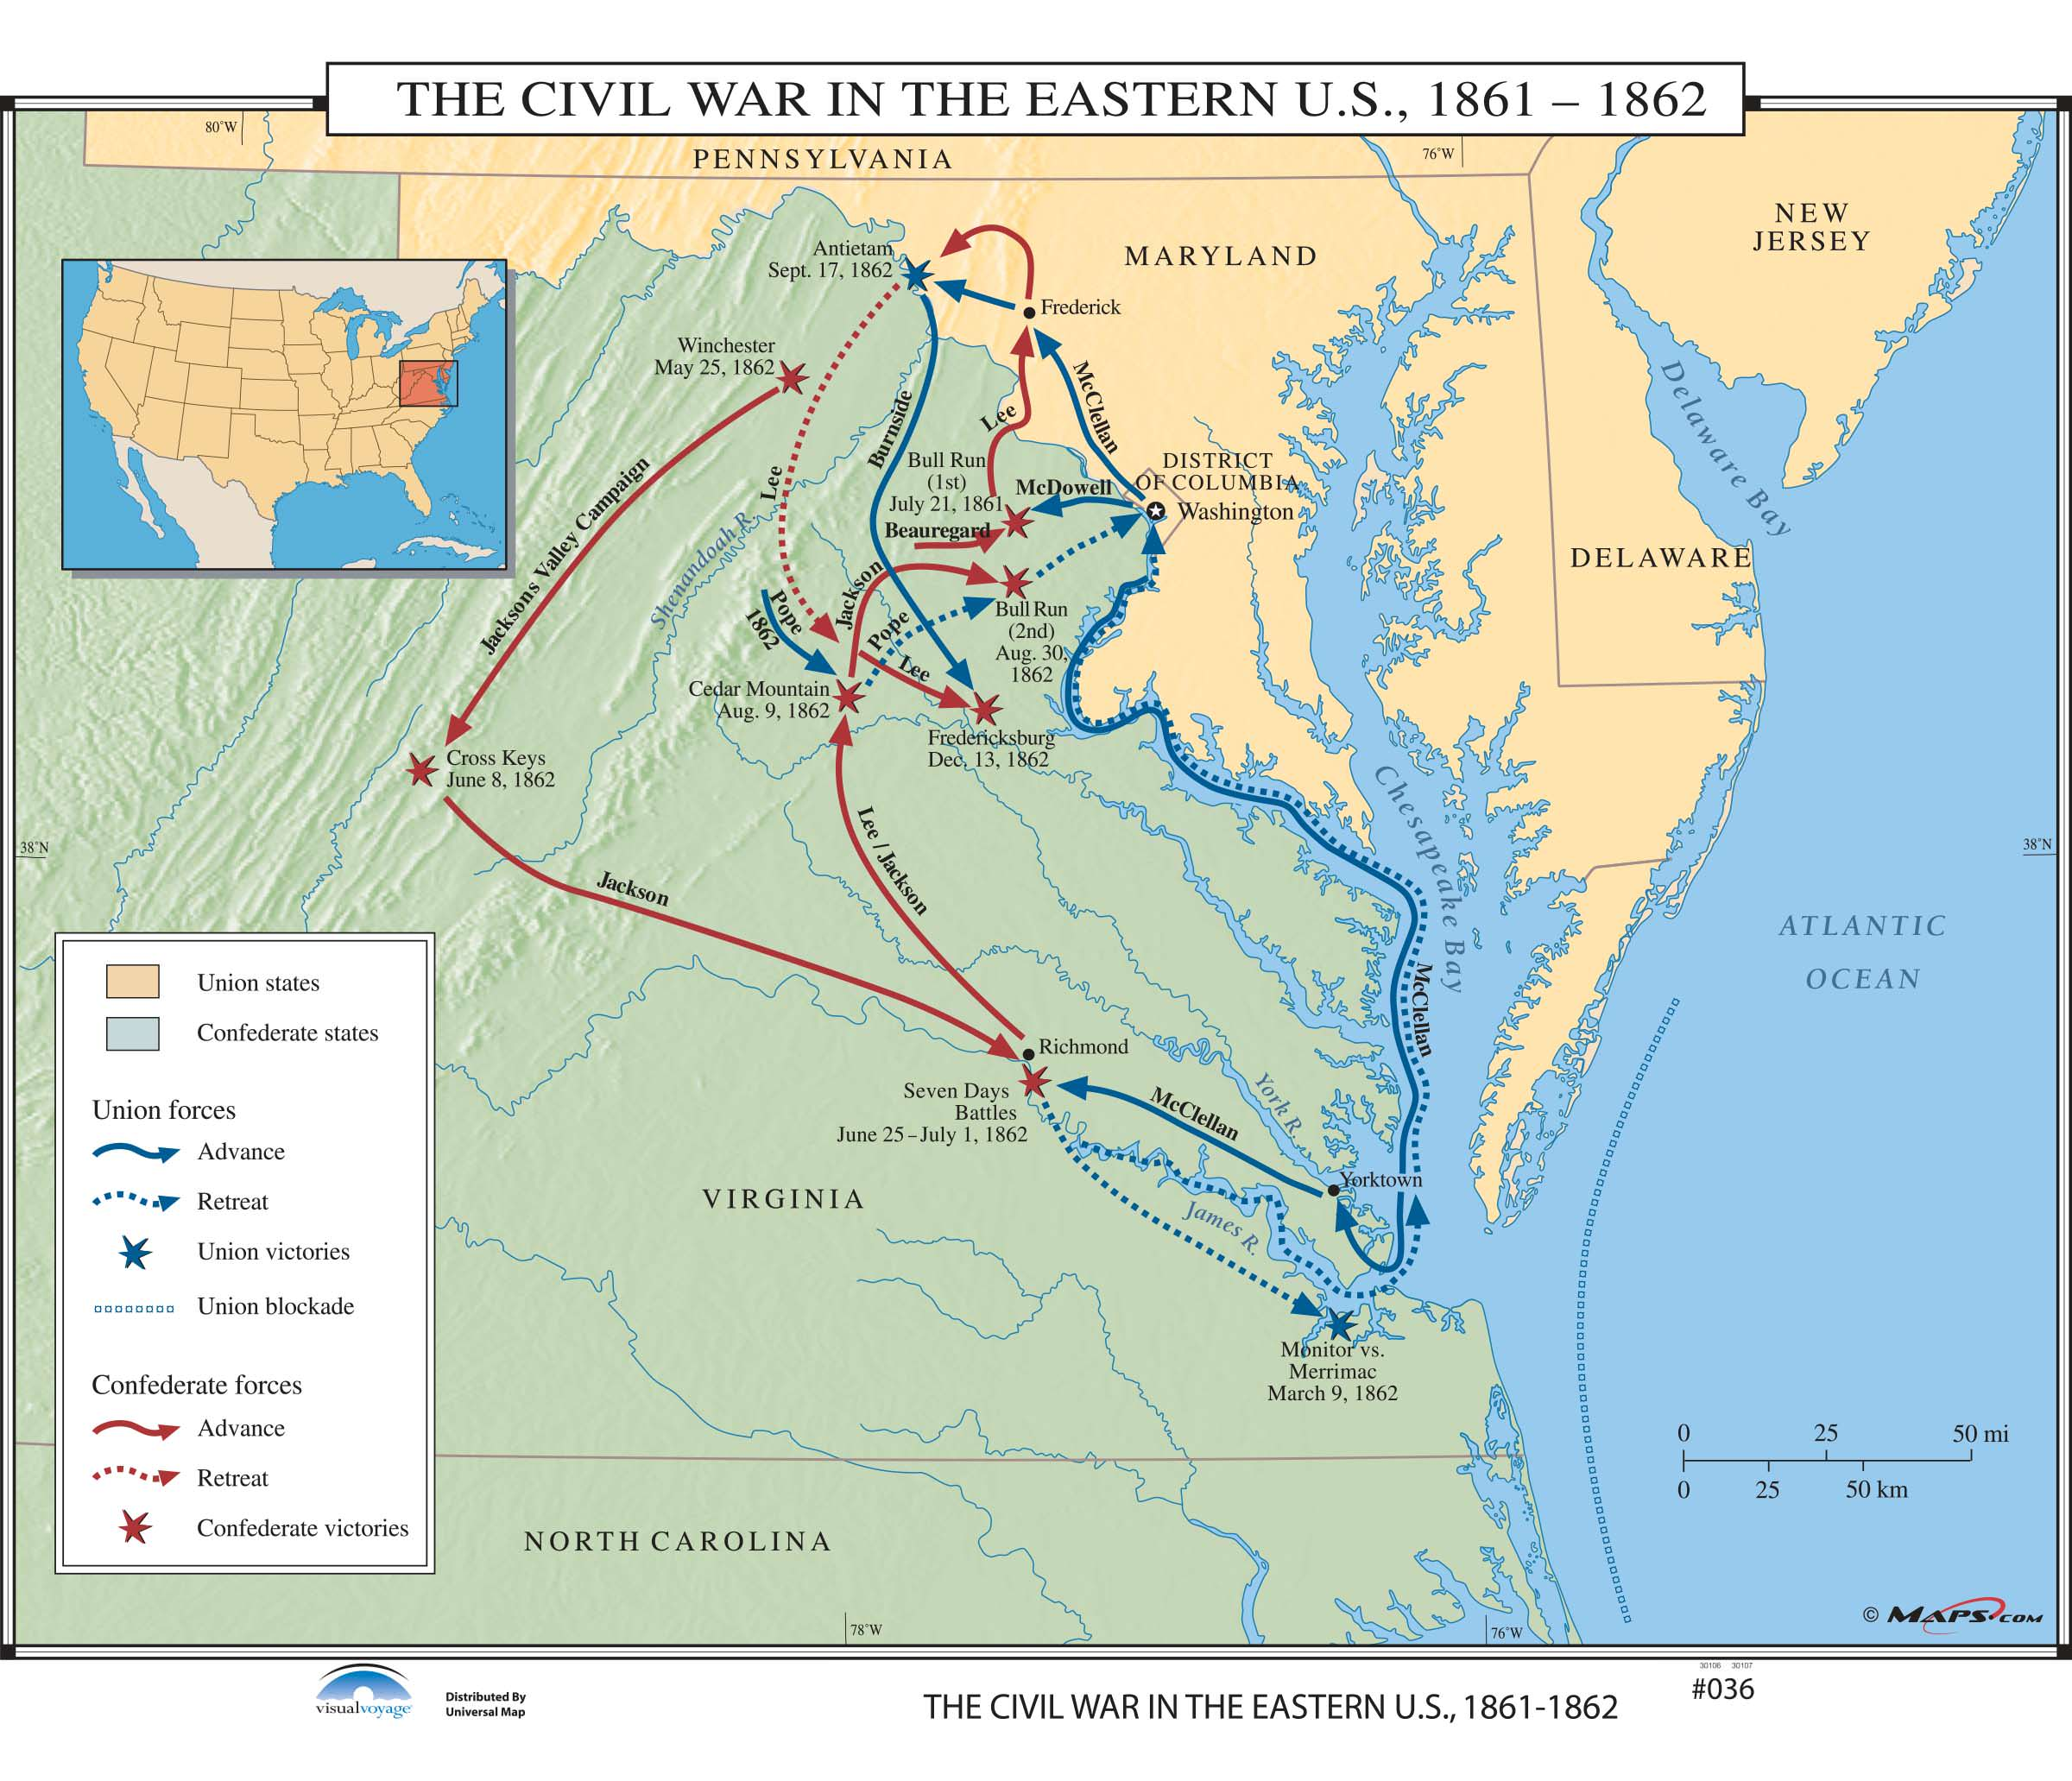 036 The Civil War In The Eastern Us Kappa